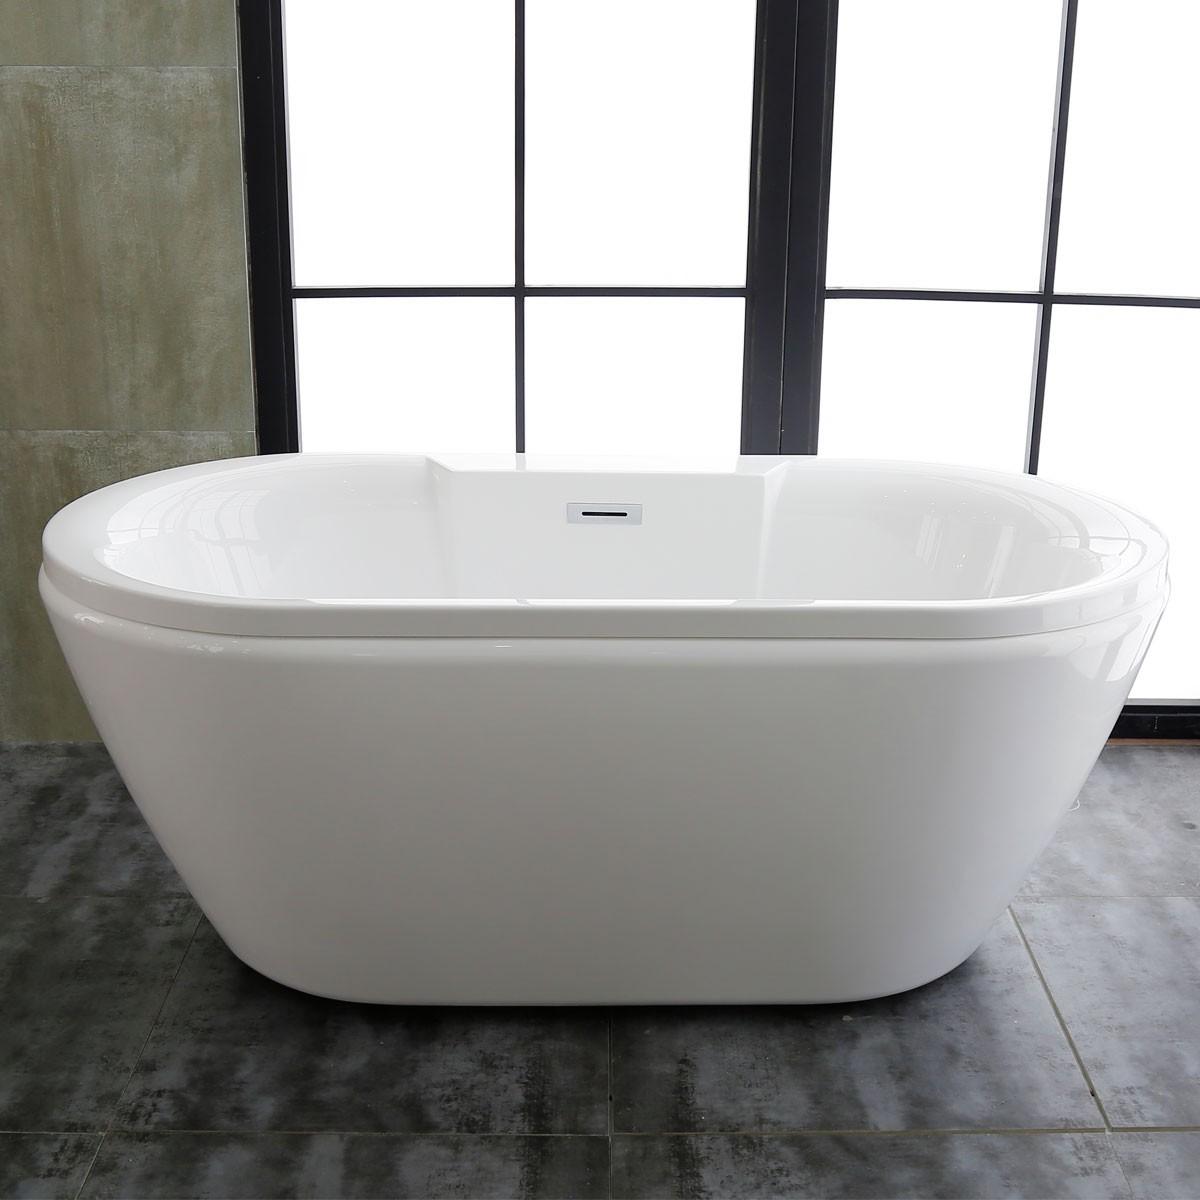 60 In Acrylic White Freestanding Bathtub (DK-MEC3061)